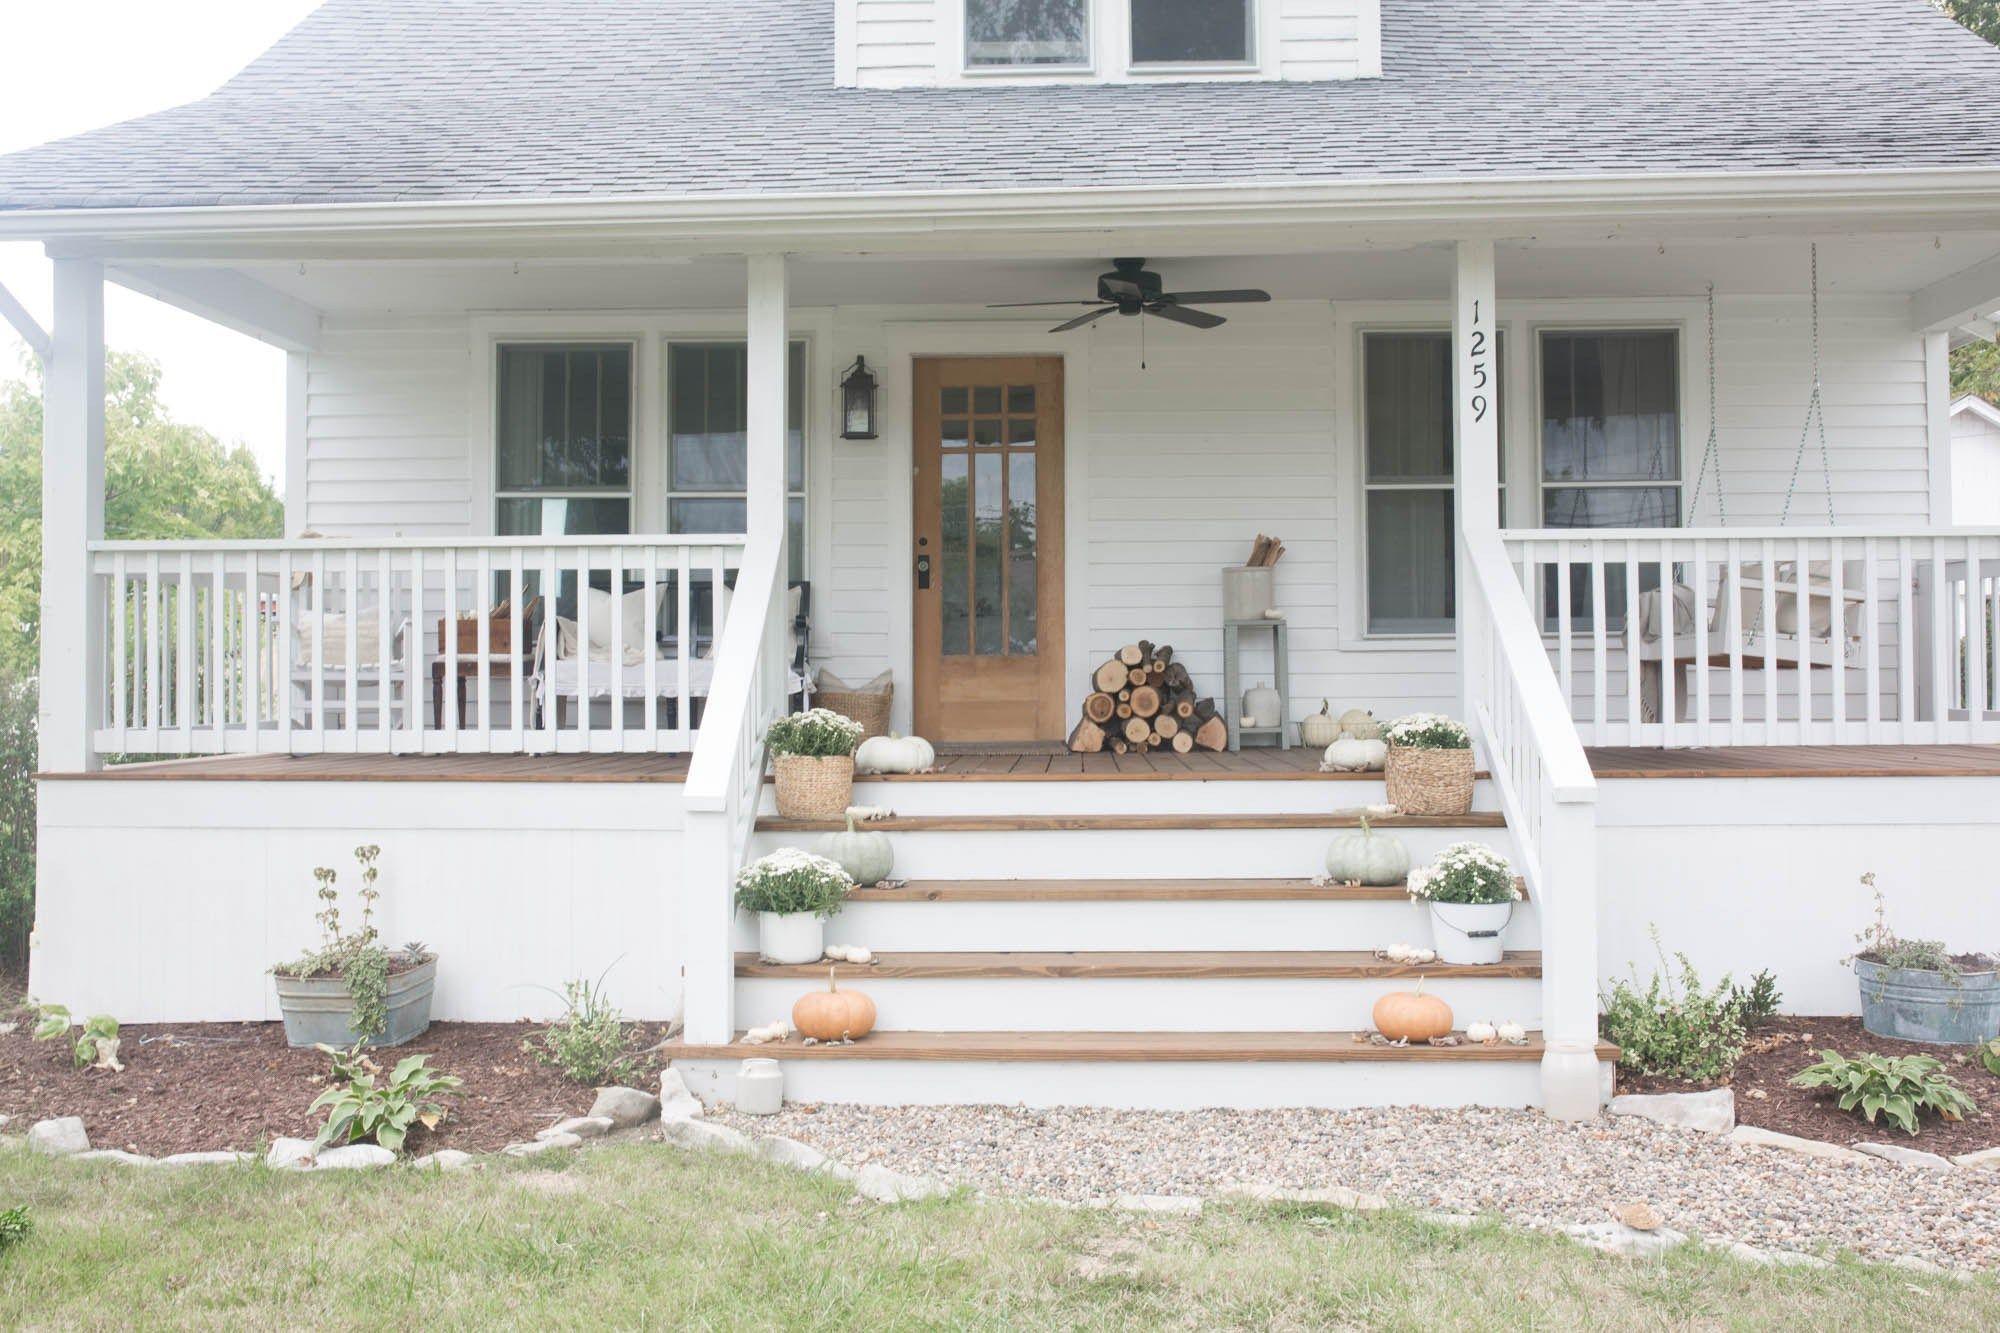 44 Most Stylish Farmhouse Front Door Design Ideas Round Decor